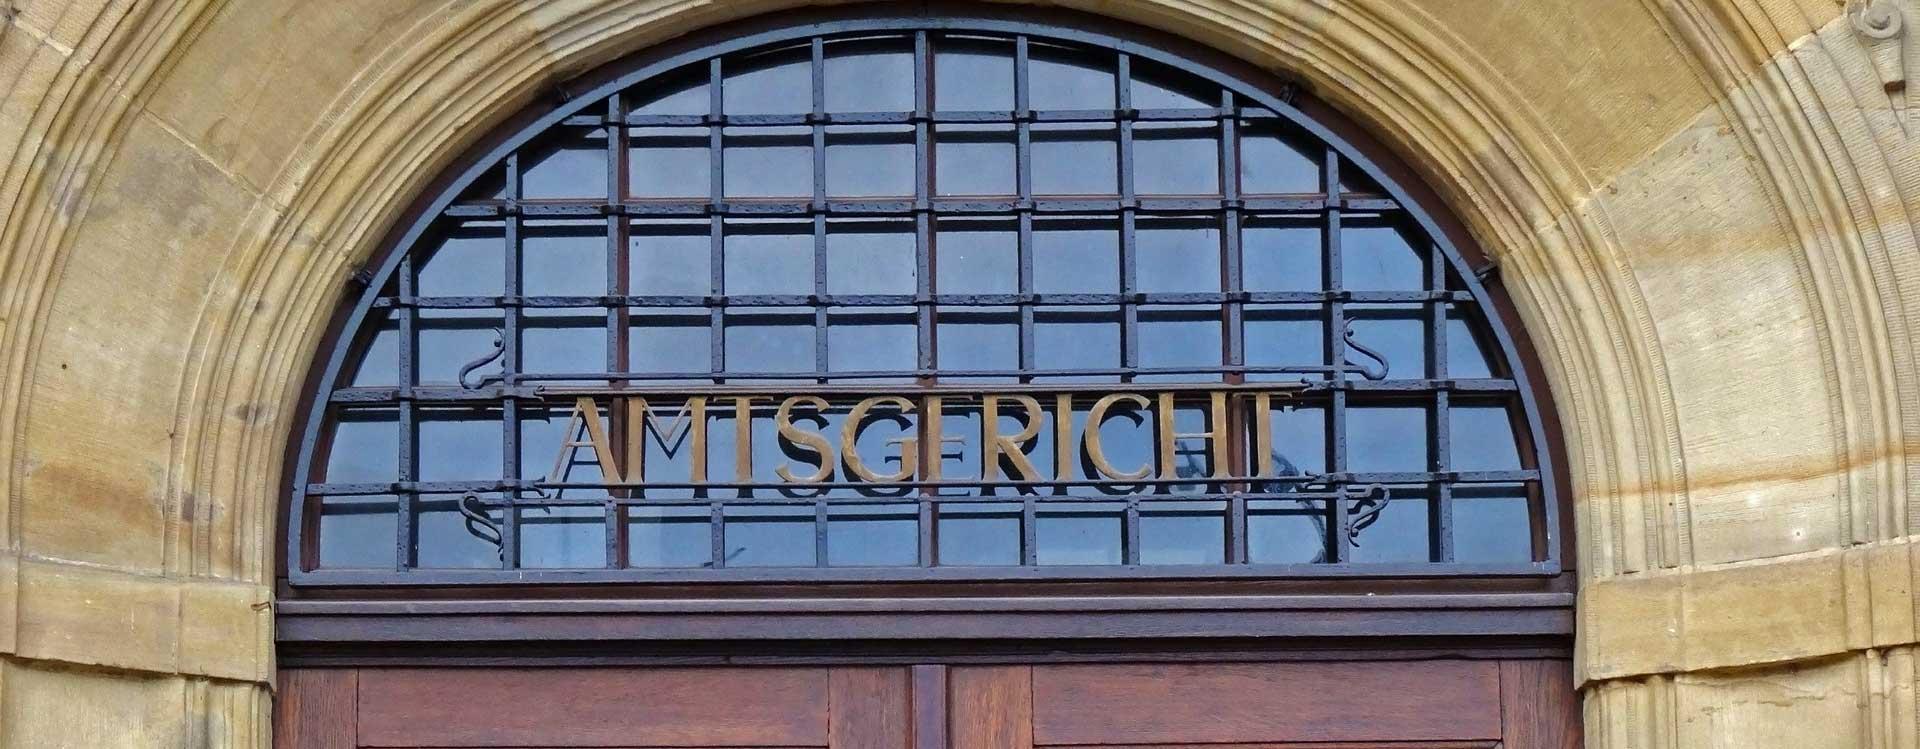 Amtsgericht Hamburg Wandsbek Strafverteidiger Hamburg